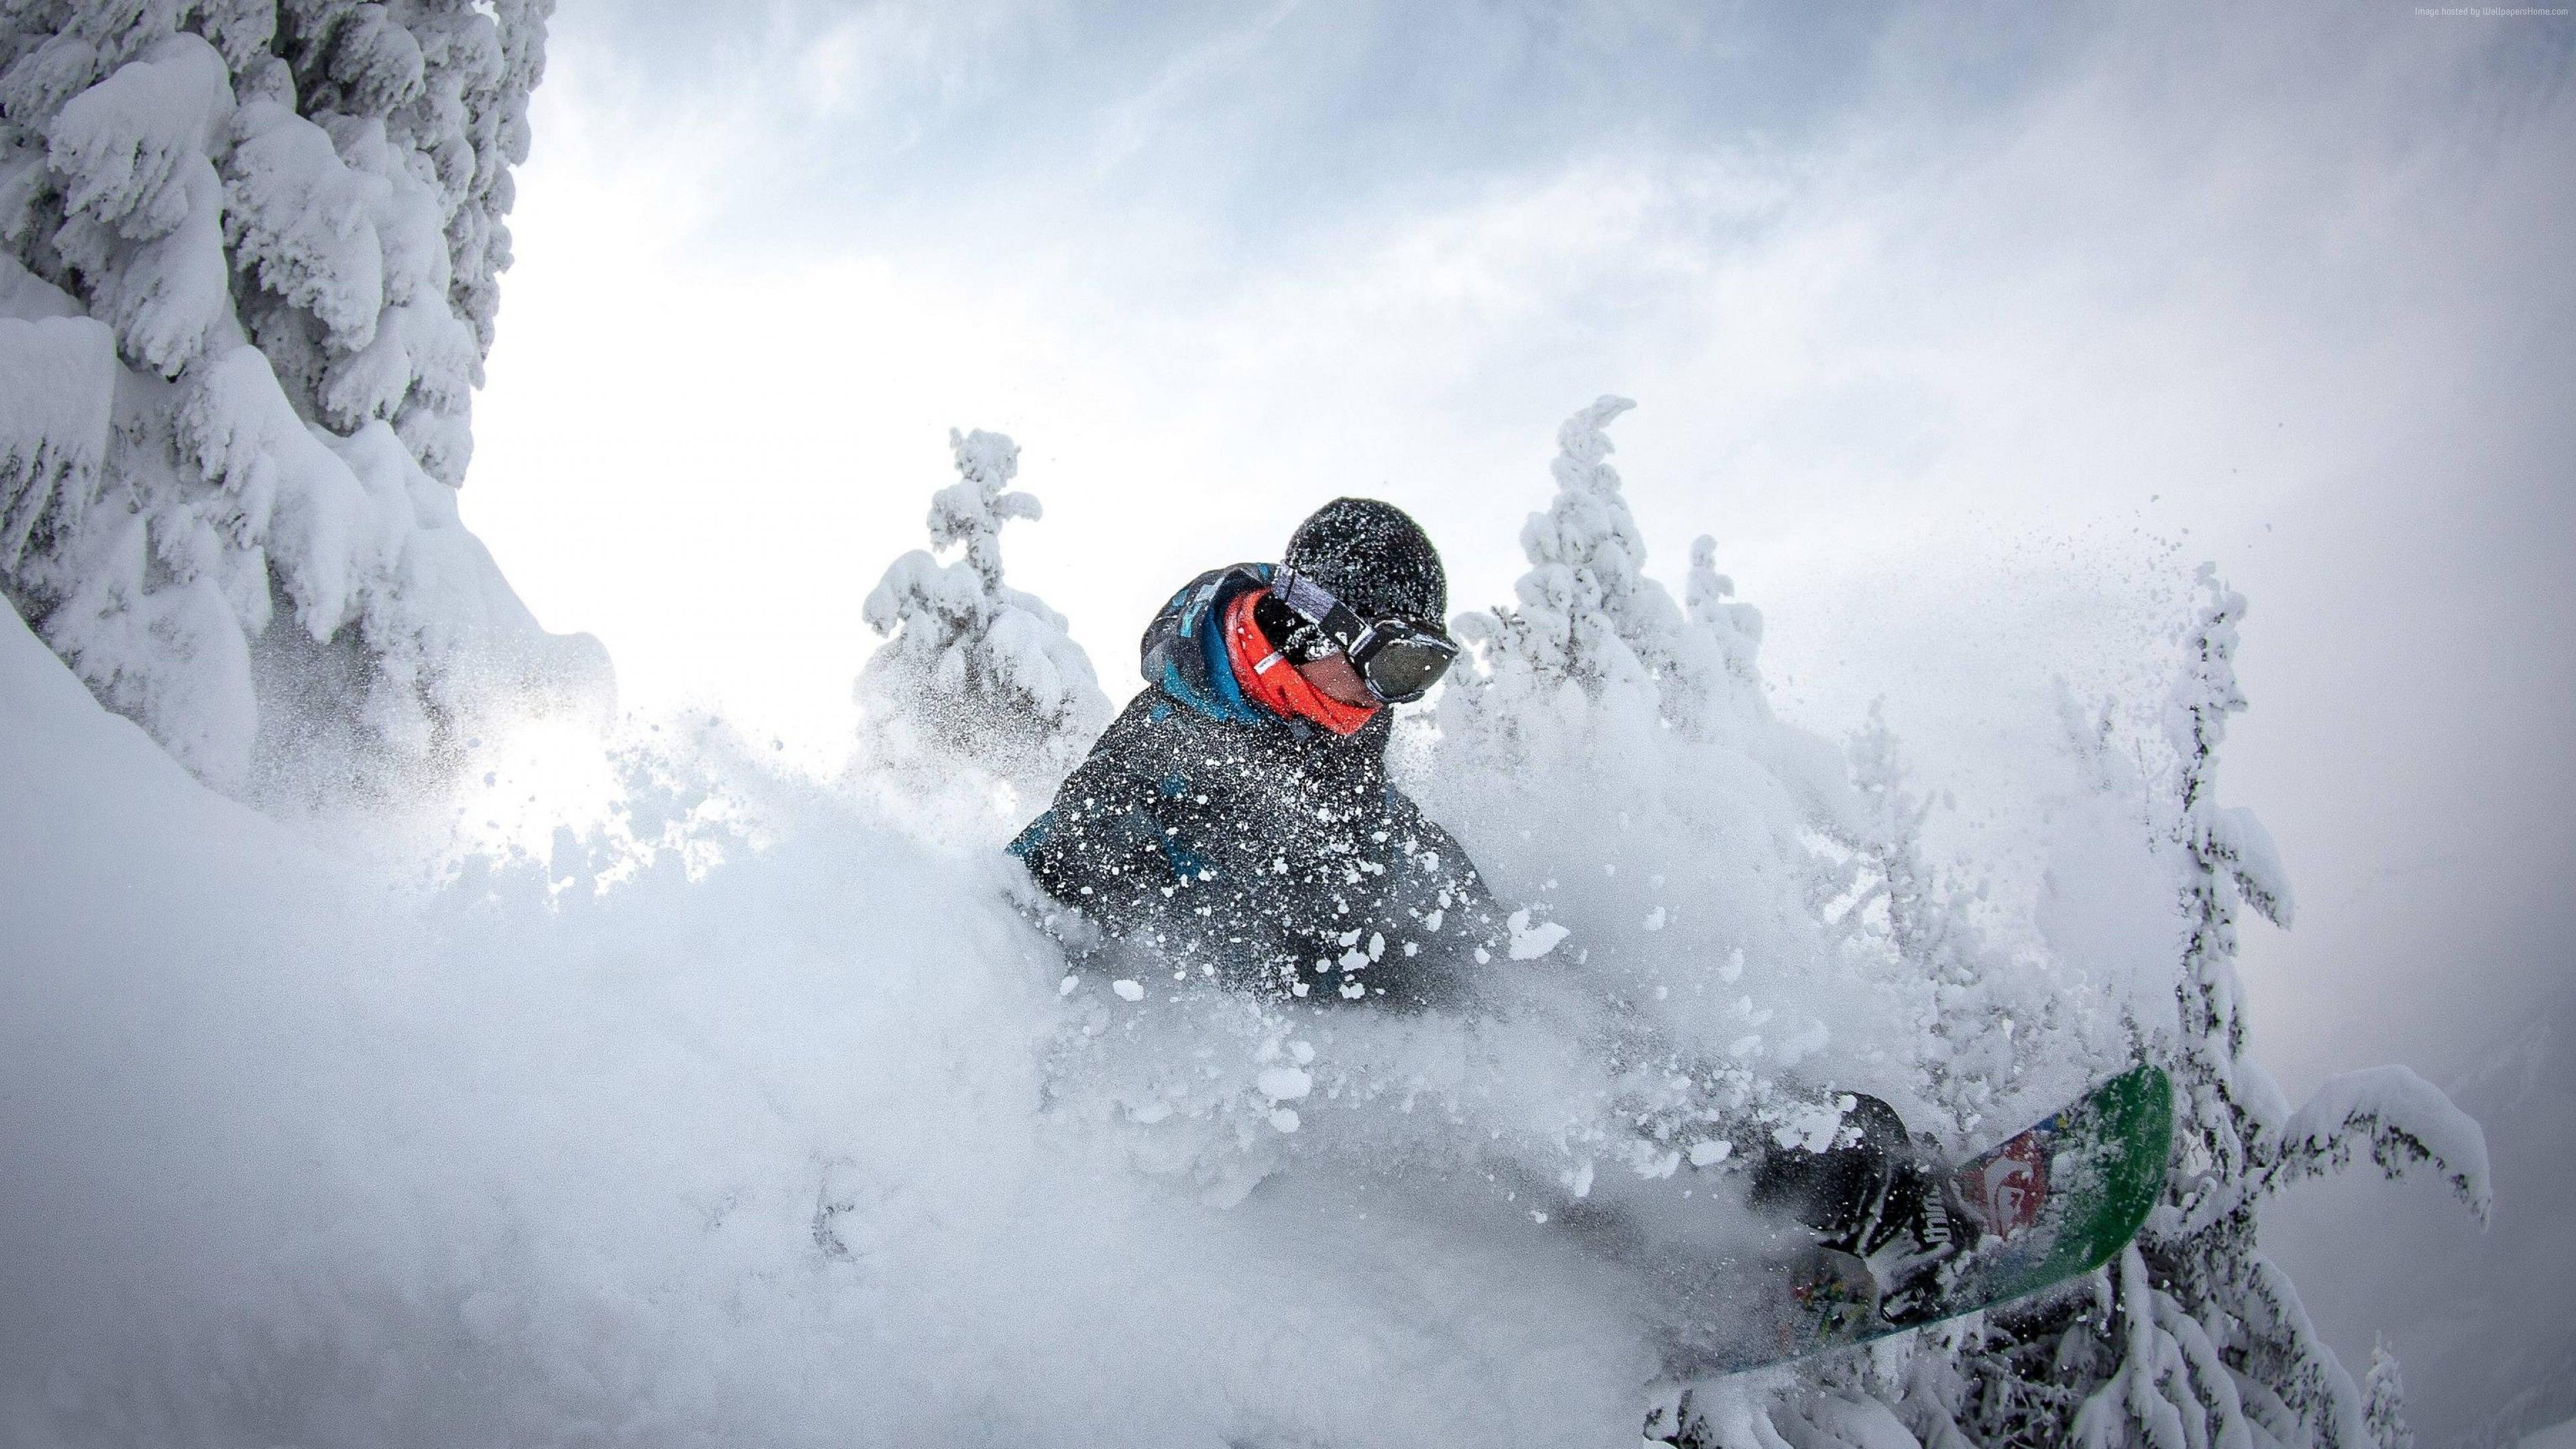 Wallpaper Snow Snowboard Winter Sport Wallpaper Download Backcountry Snowboarding Snowboard Snowboarding